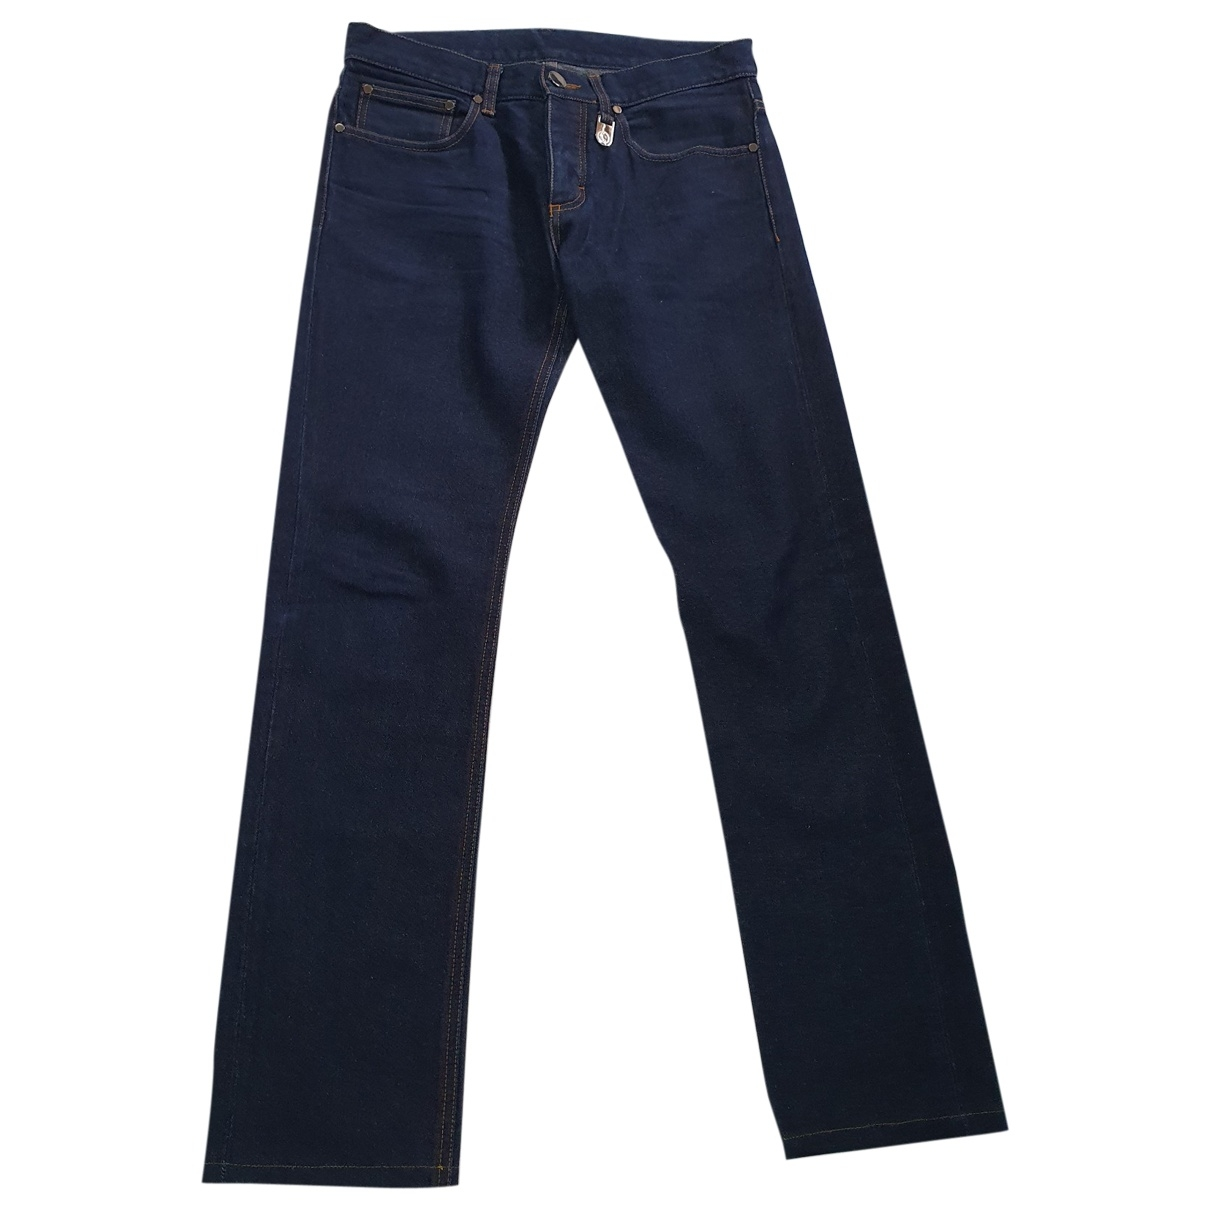 Dirk Bikkembergs \N Blue Cotton Jeans for Men 31 US